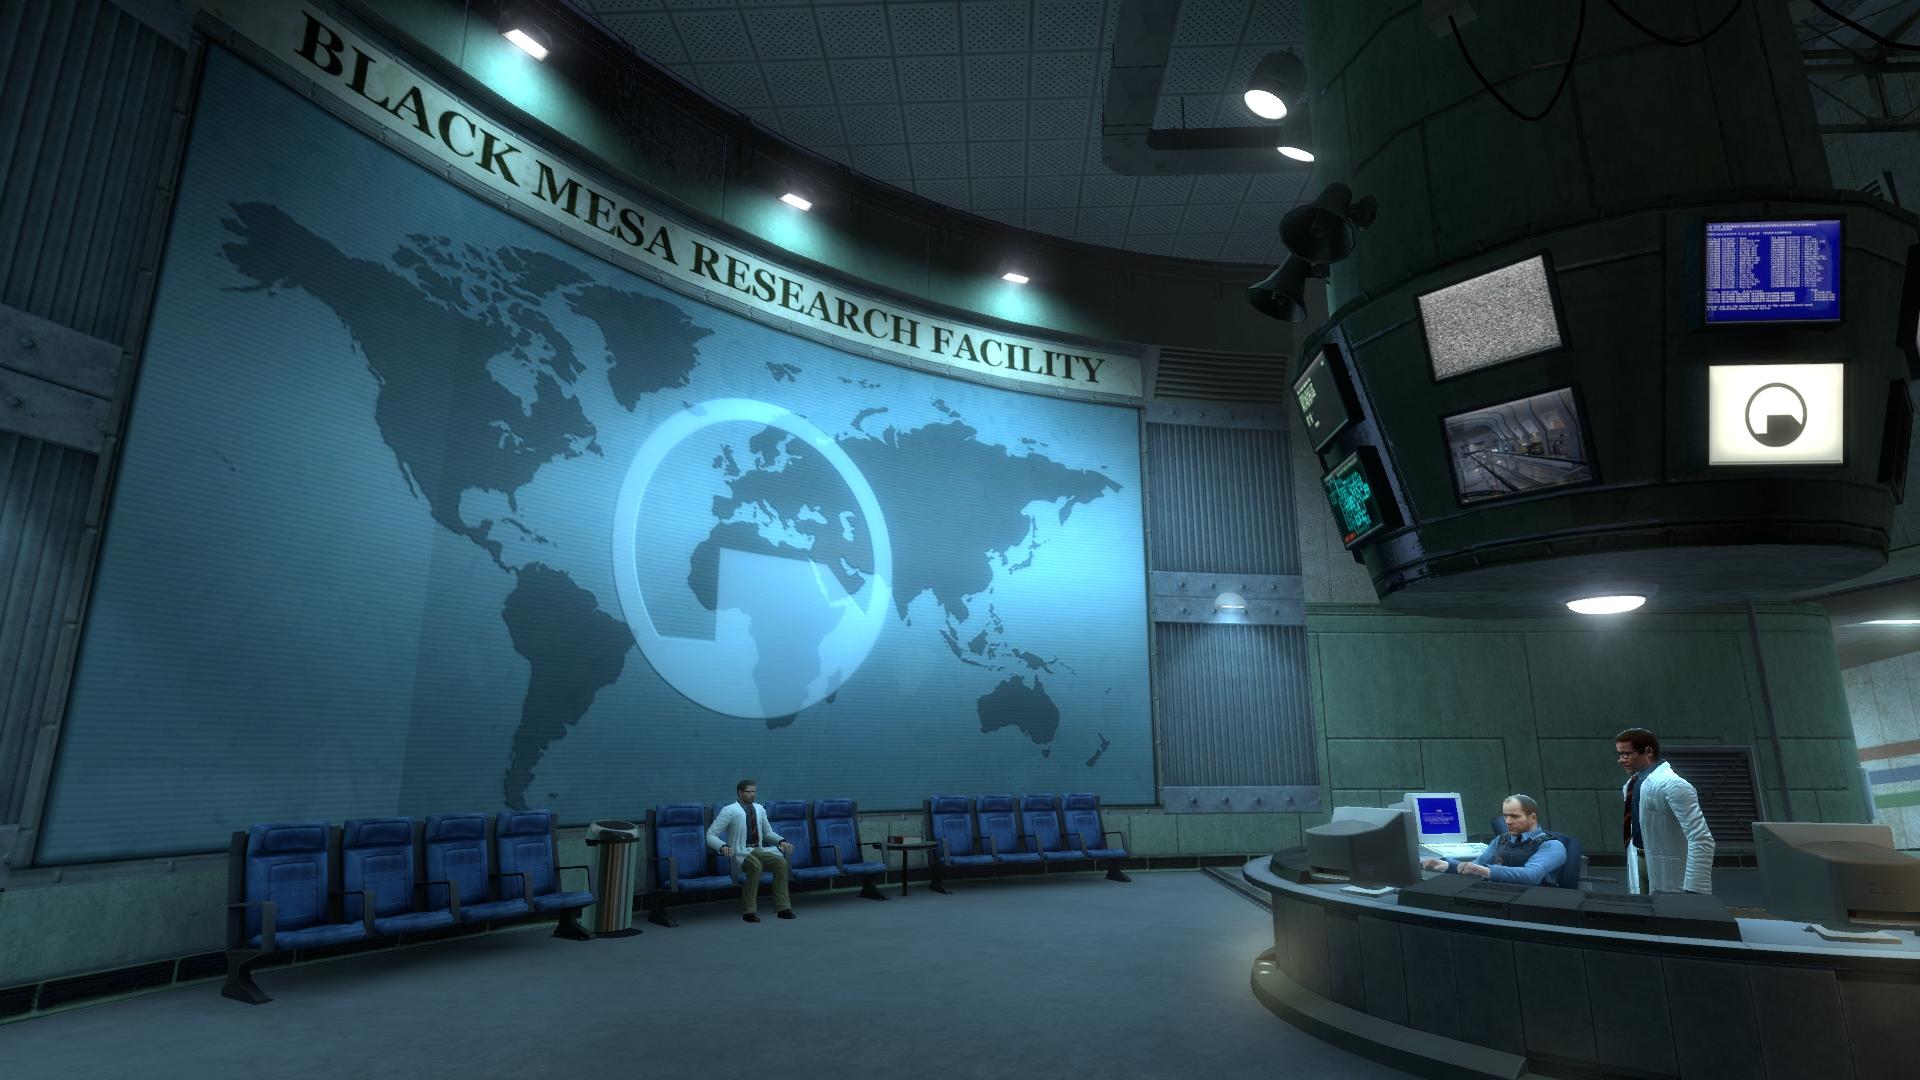 『Half-Life』のMod「Black Mesa」